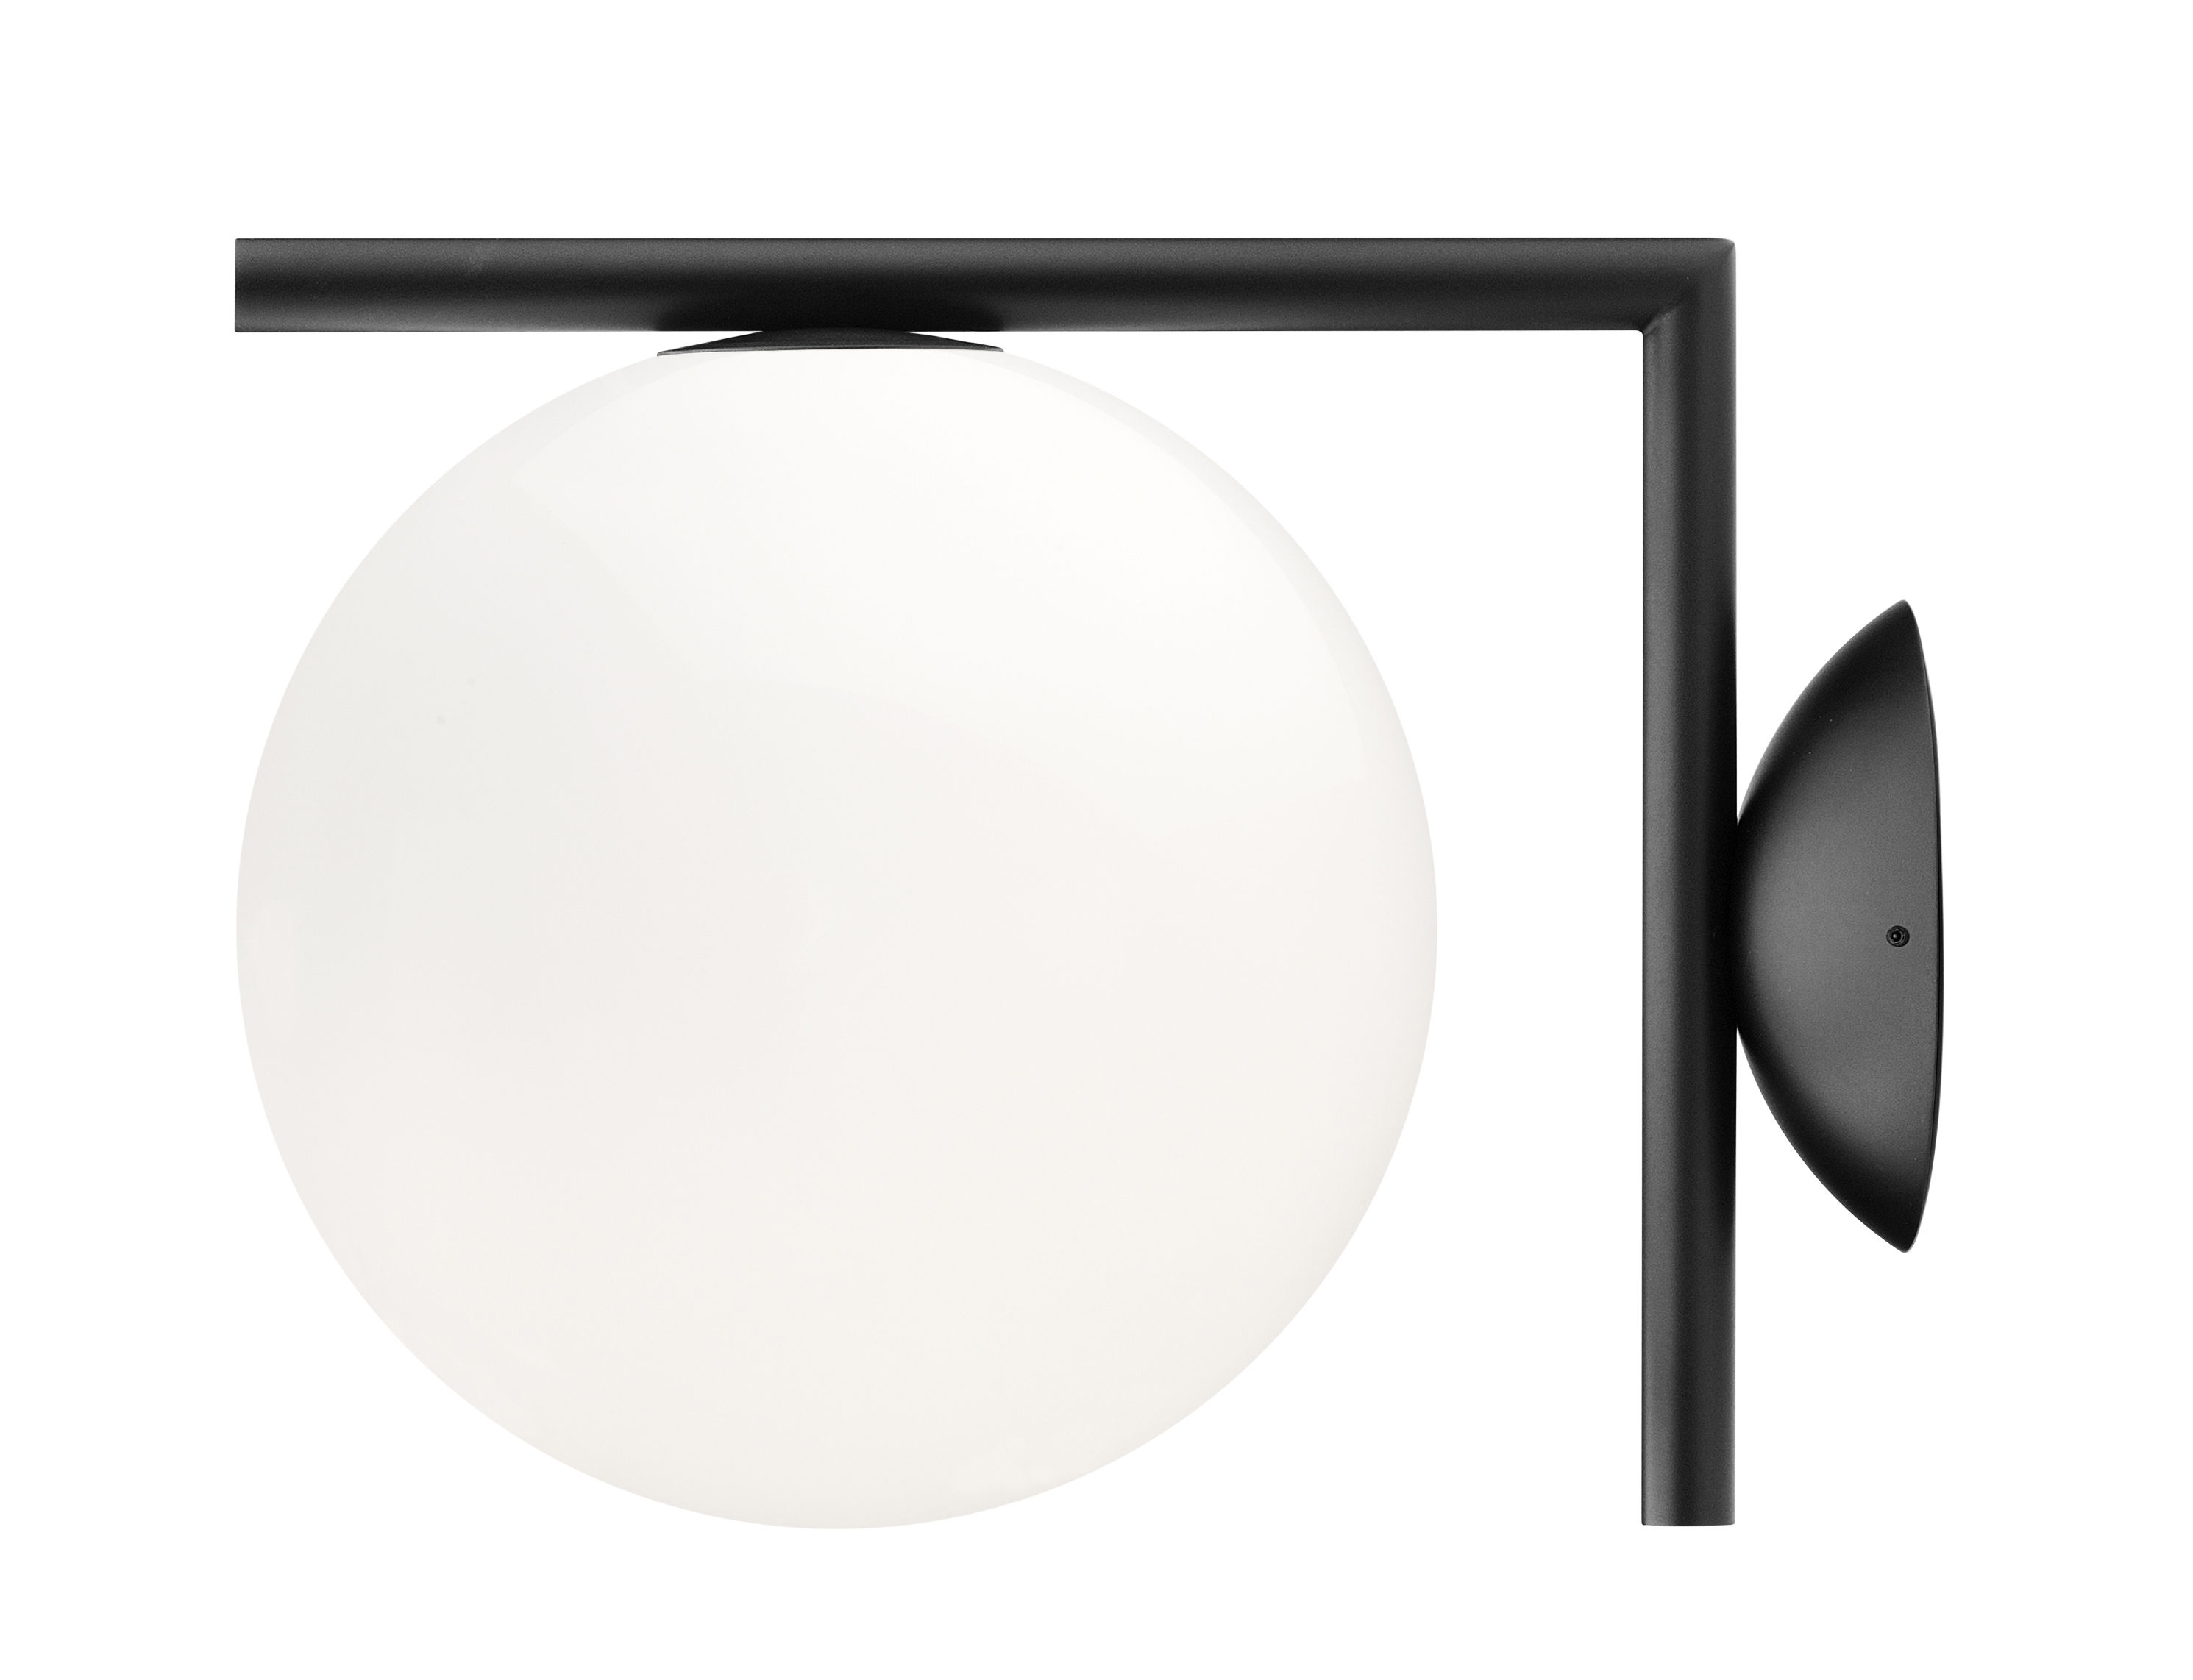 Applique ic w flos nero h Ø made in design